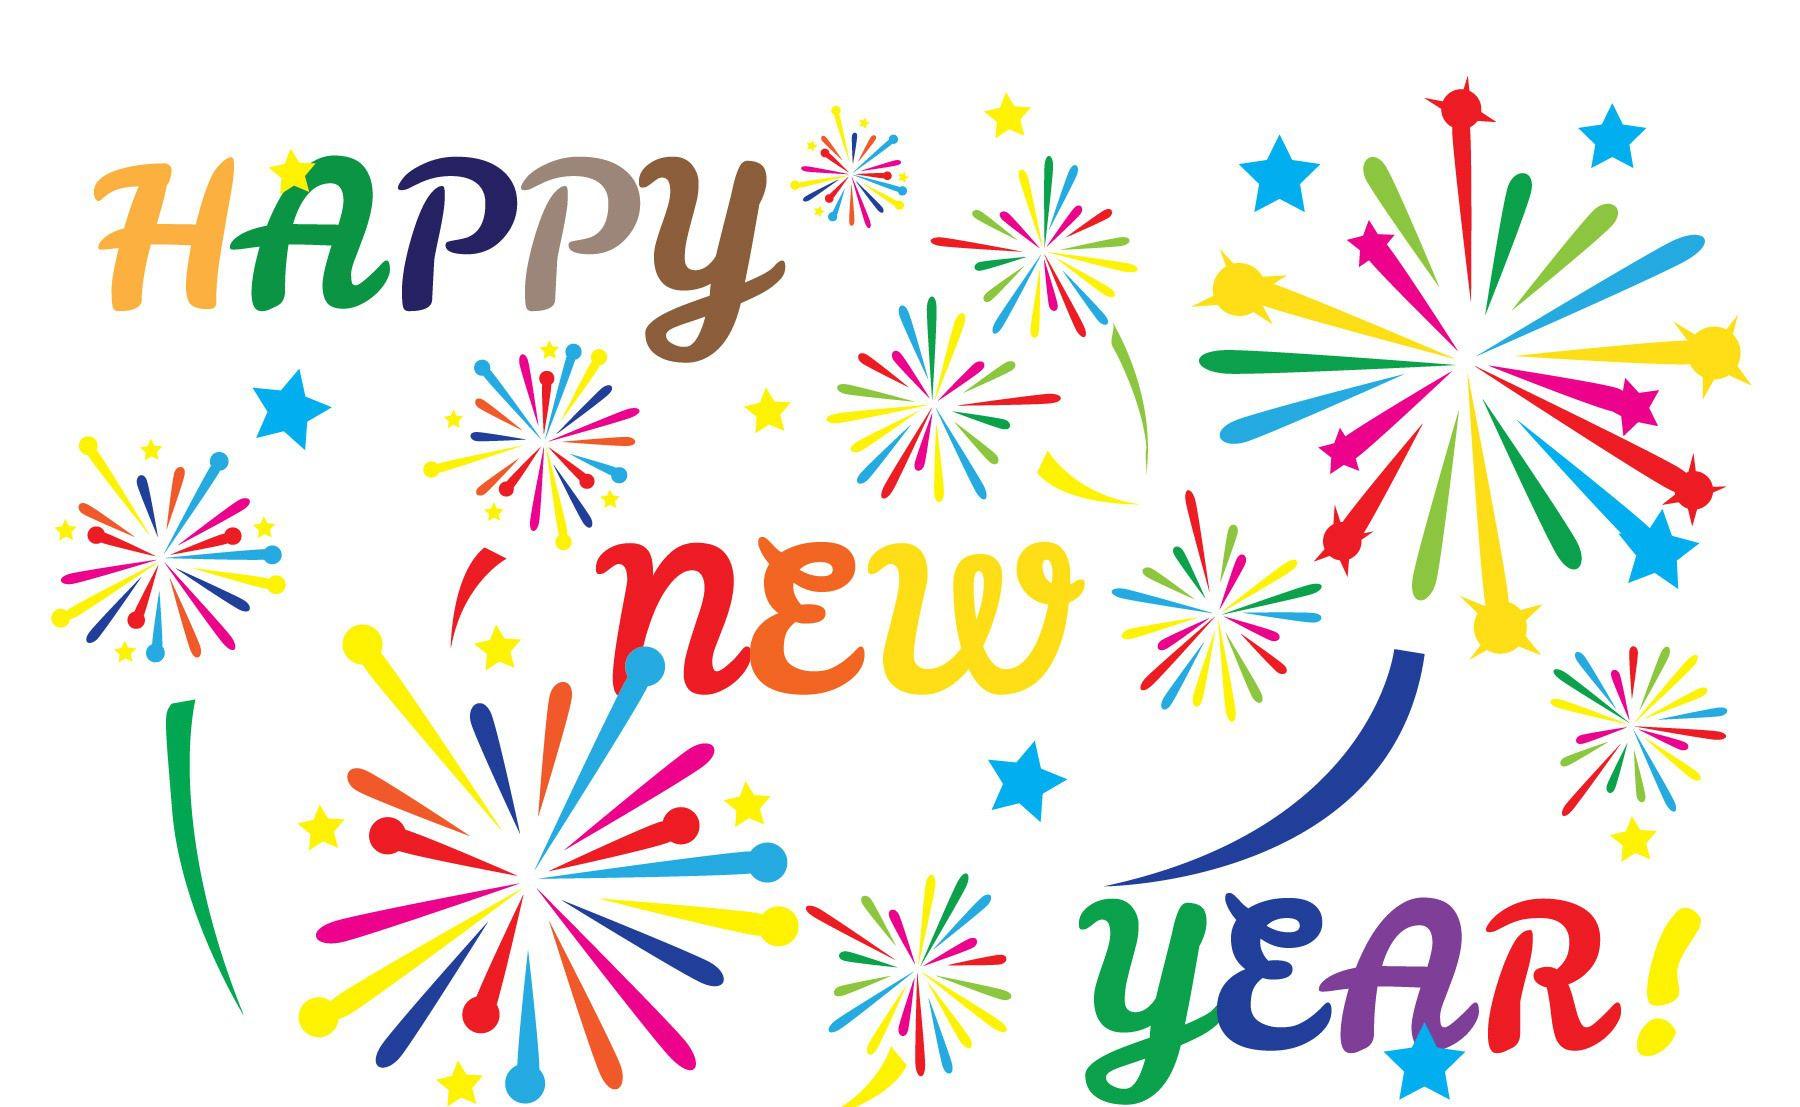 Clip Art. Happy New Year Clipart Free. Drupload.com Free Clipart.